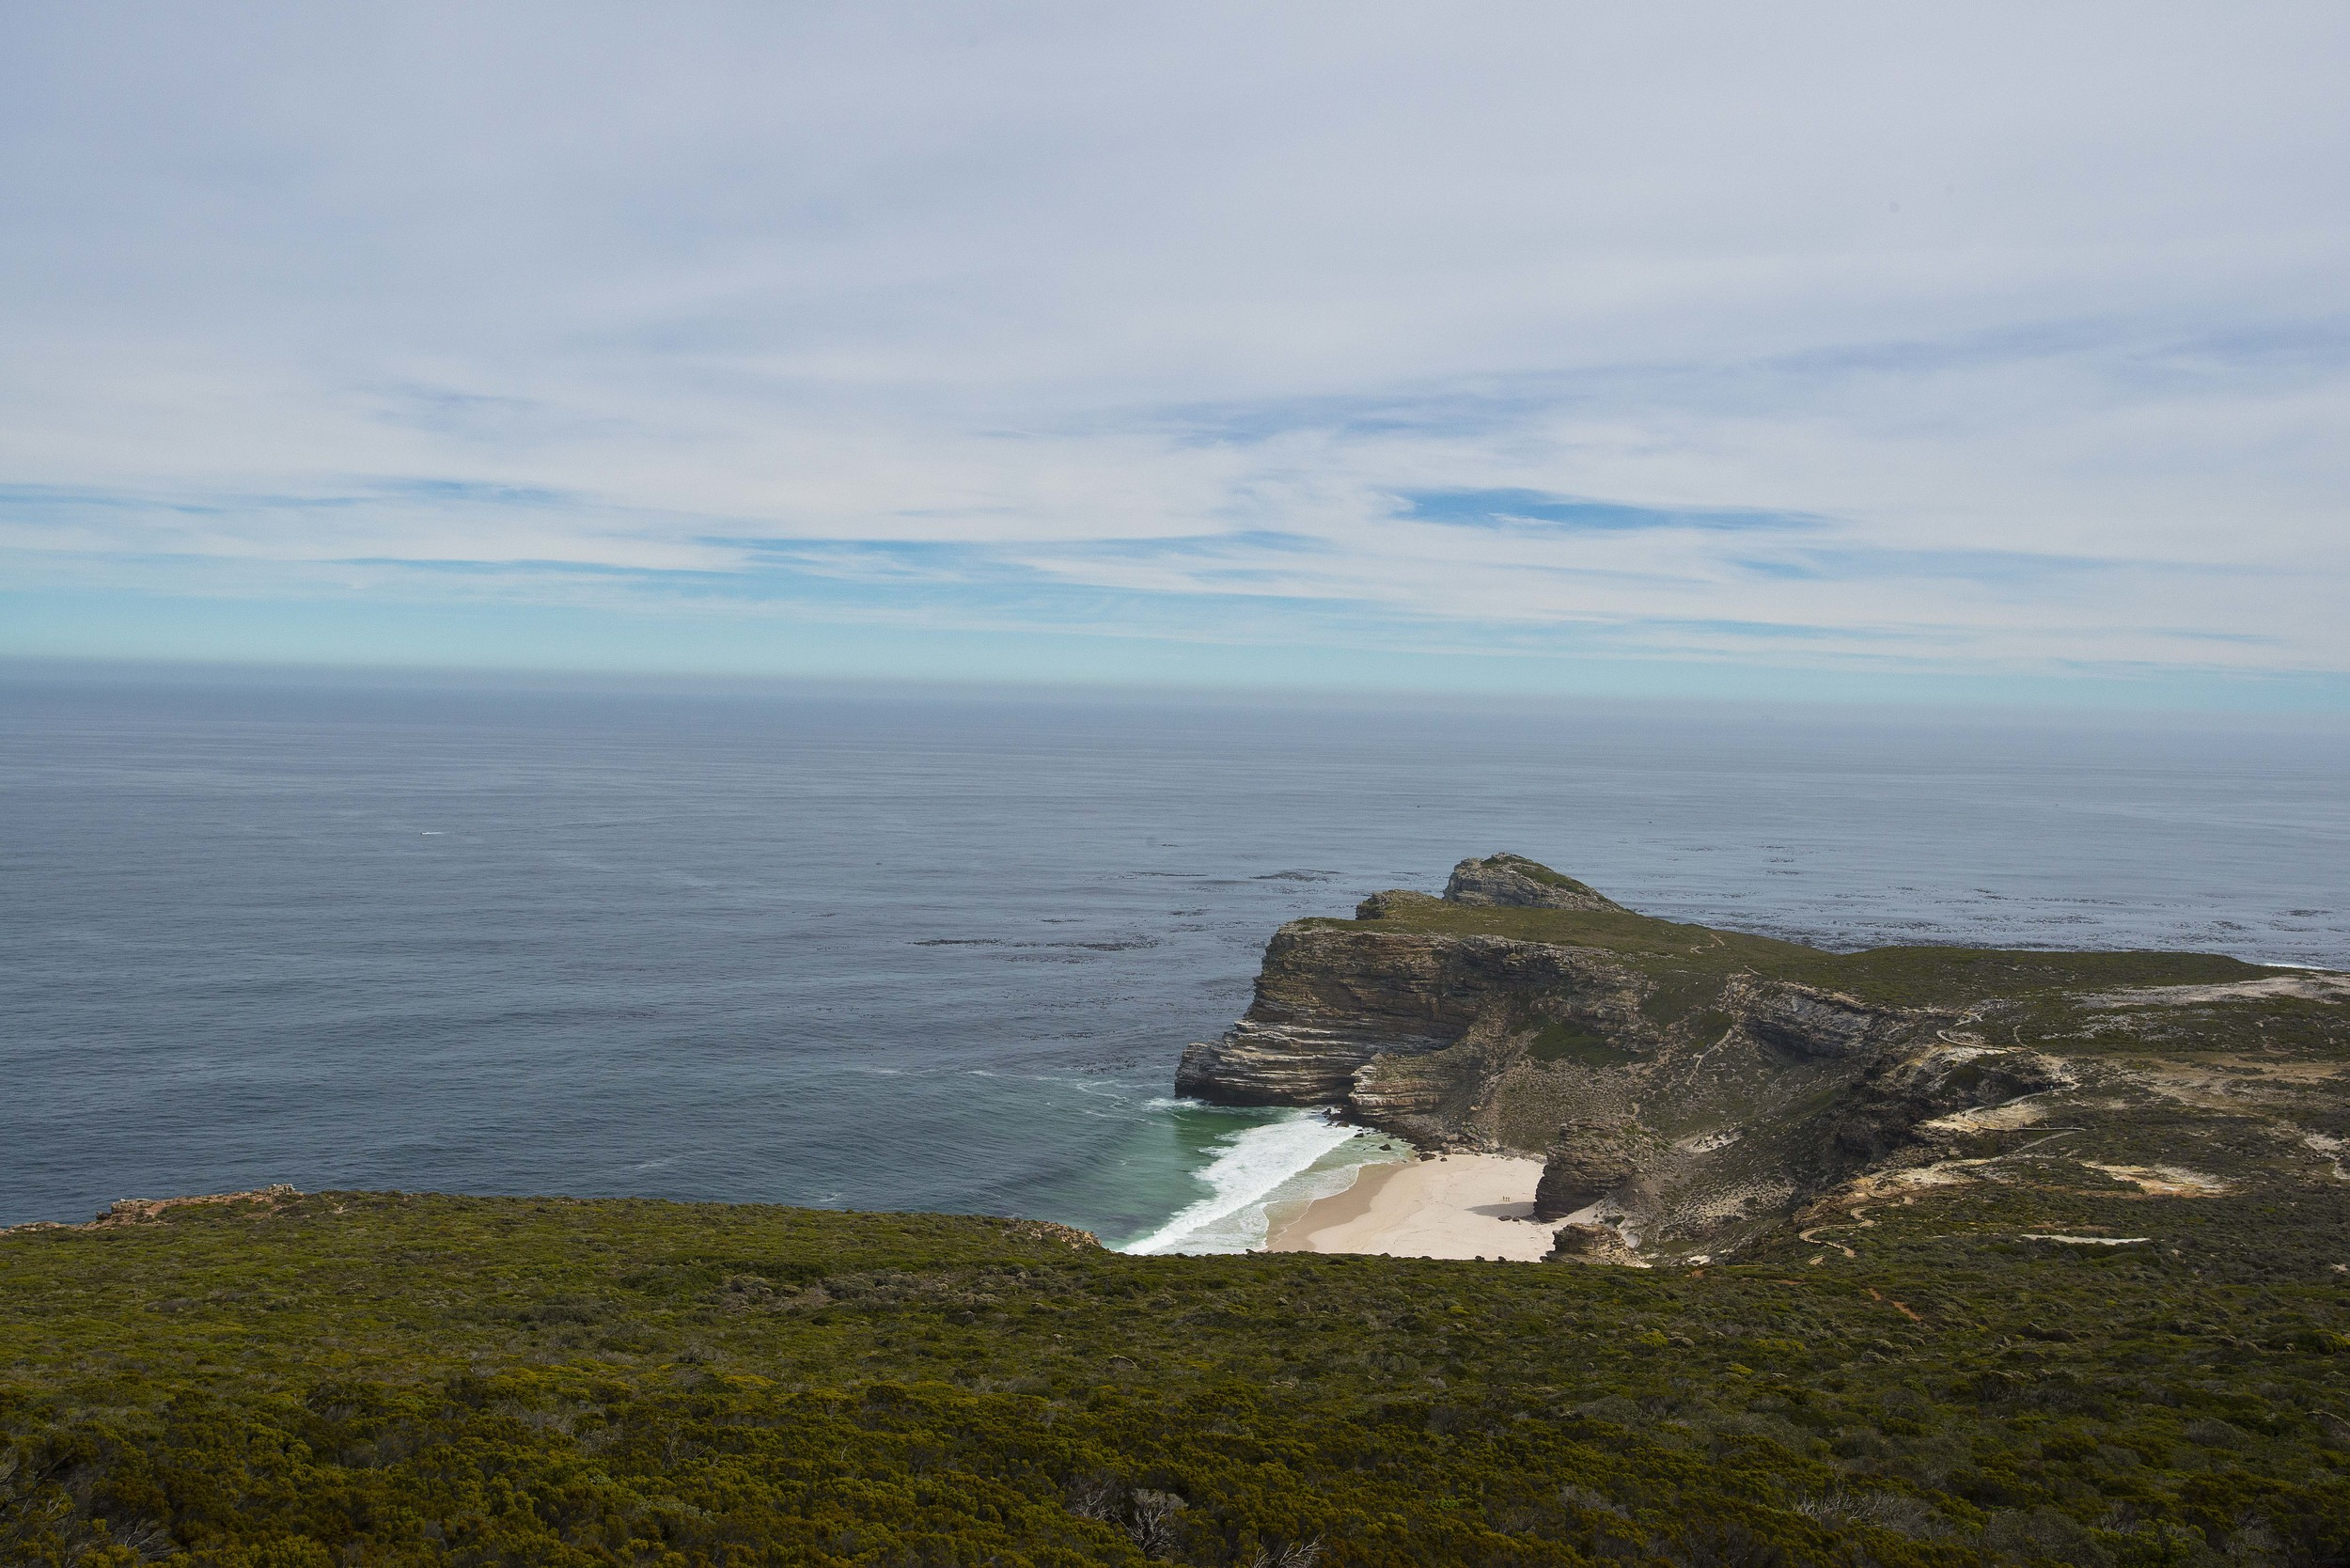 130420_DSC2794 Cape Point - Cape of Good Hope.jpg